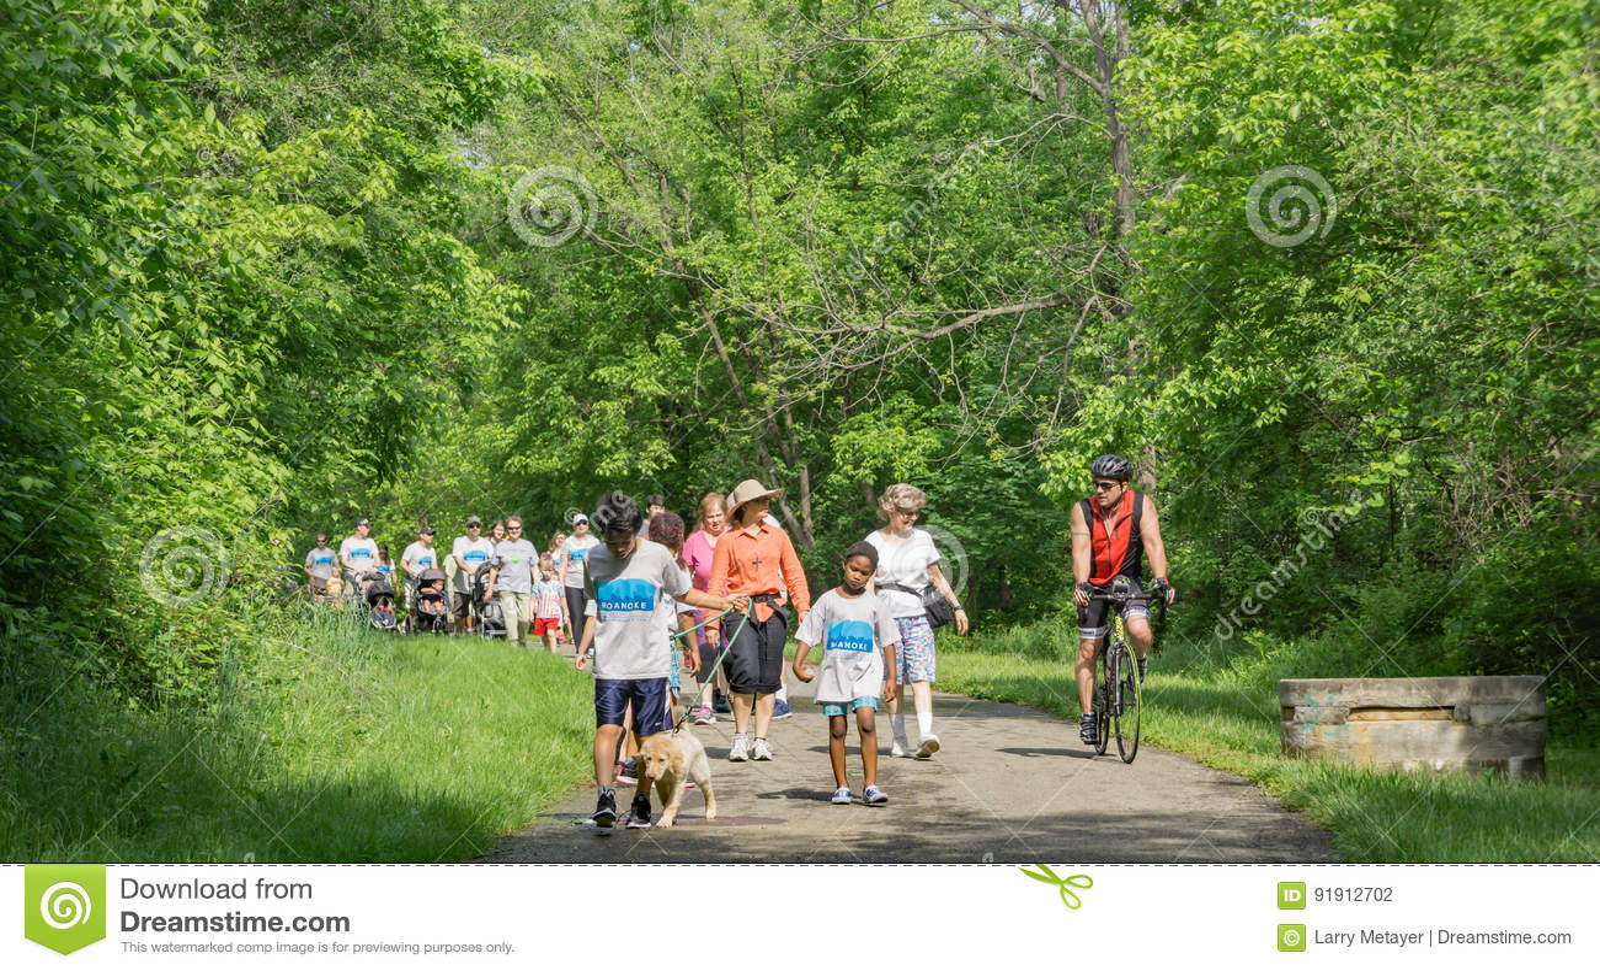 Walk for Life, Roanoke, Virginia, USA